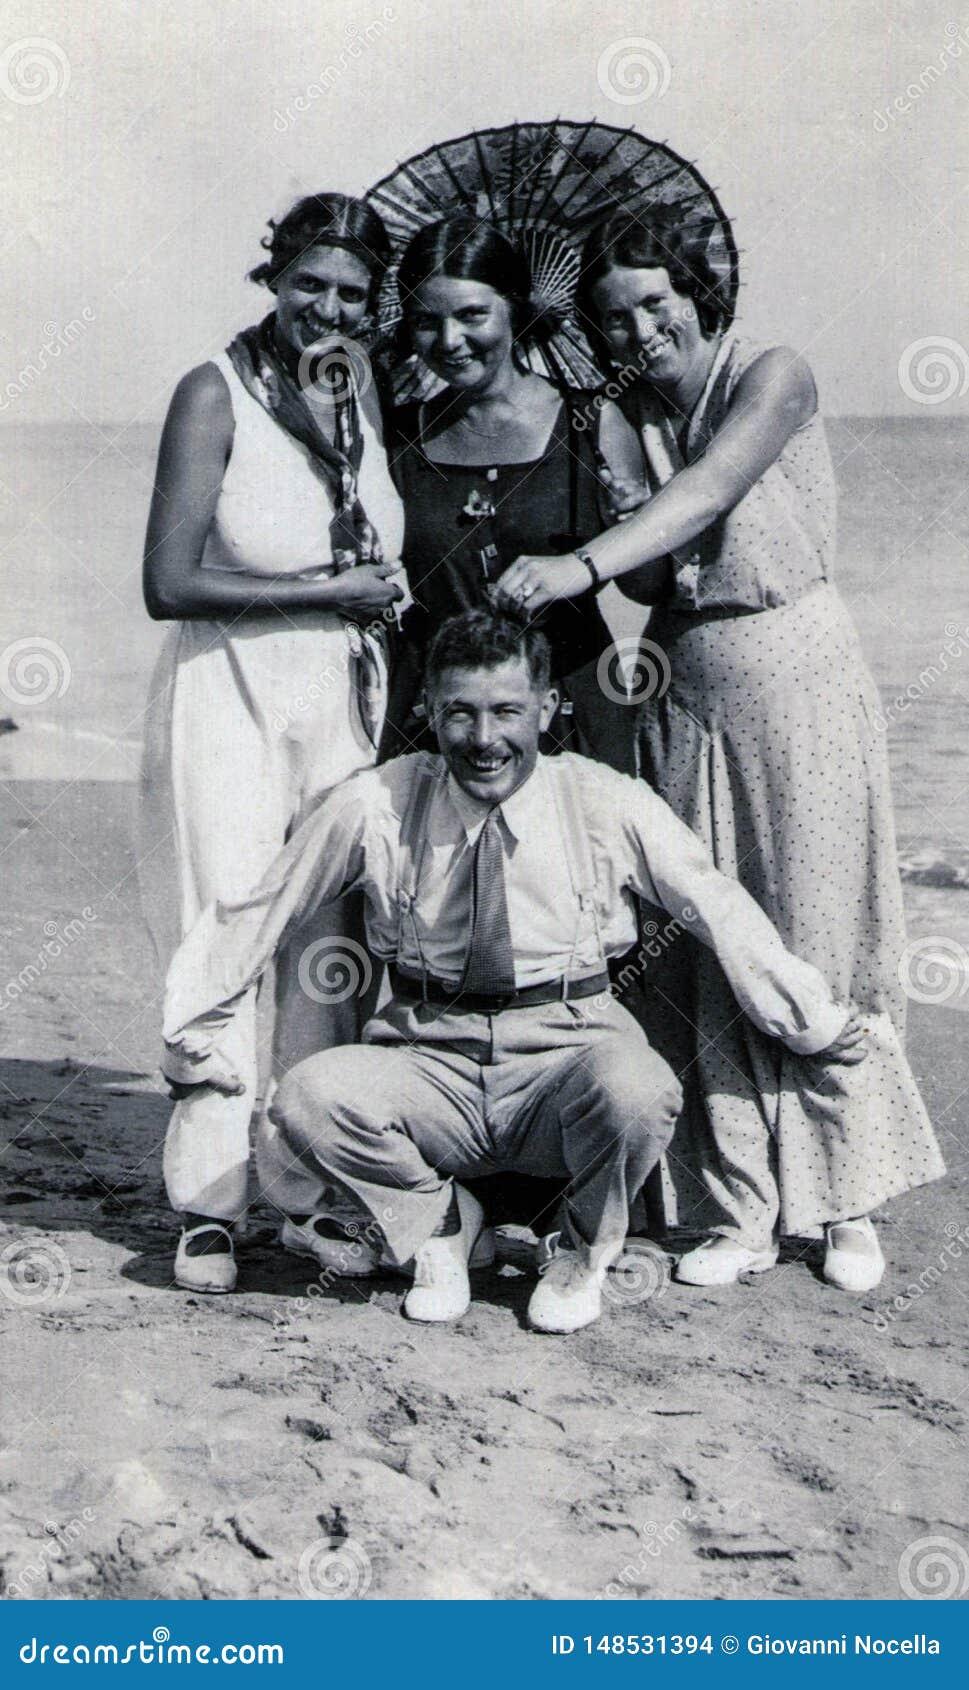 Capri, Italy, 1933 - Three tanned girls and their frind joke on the beach